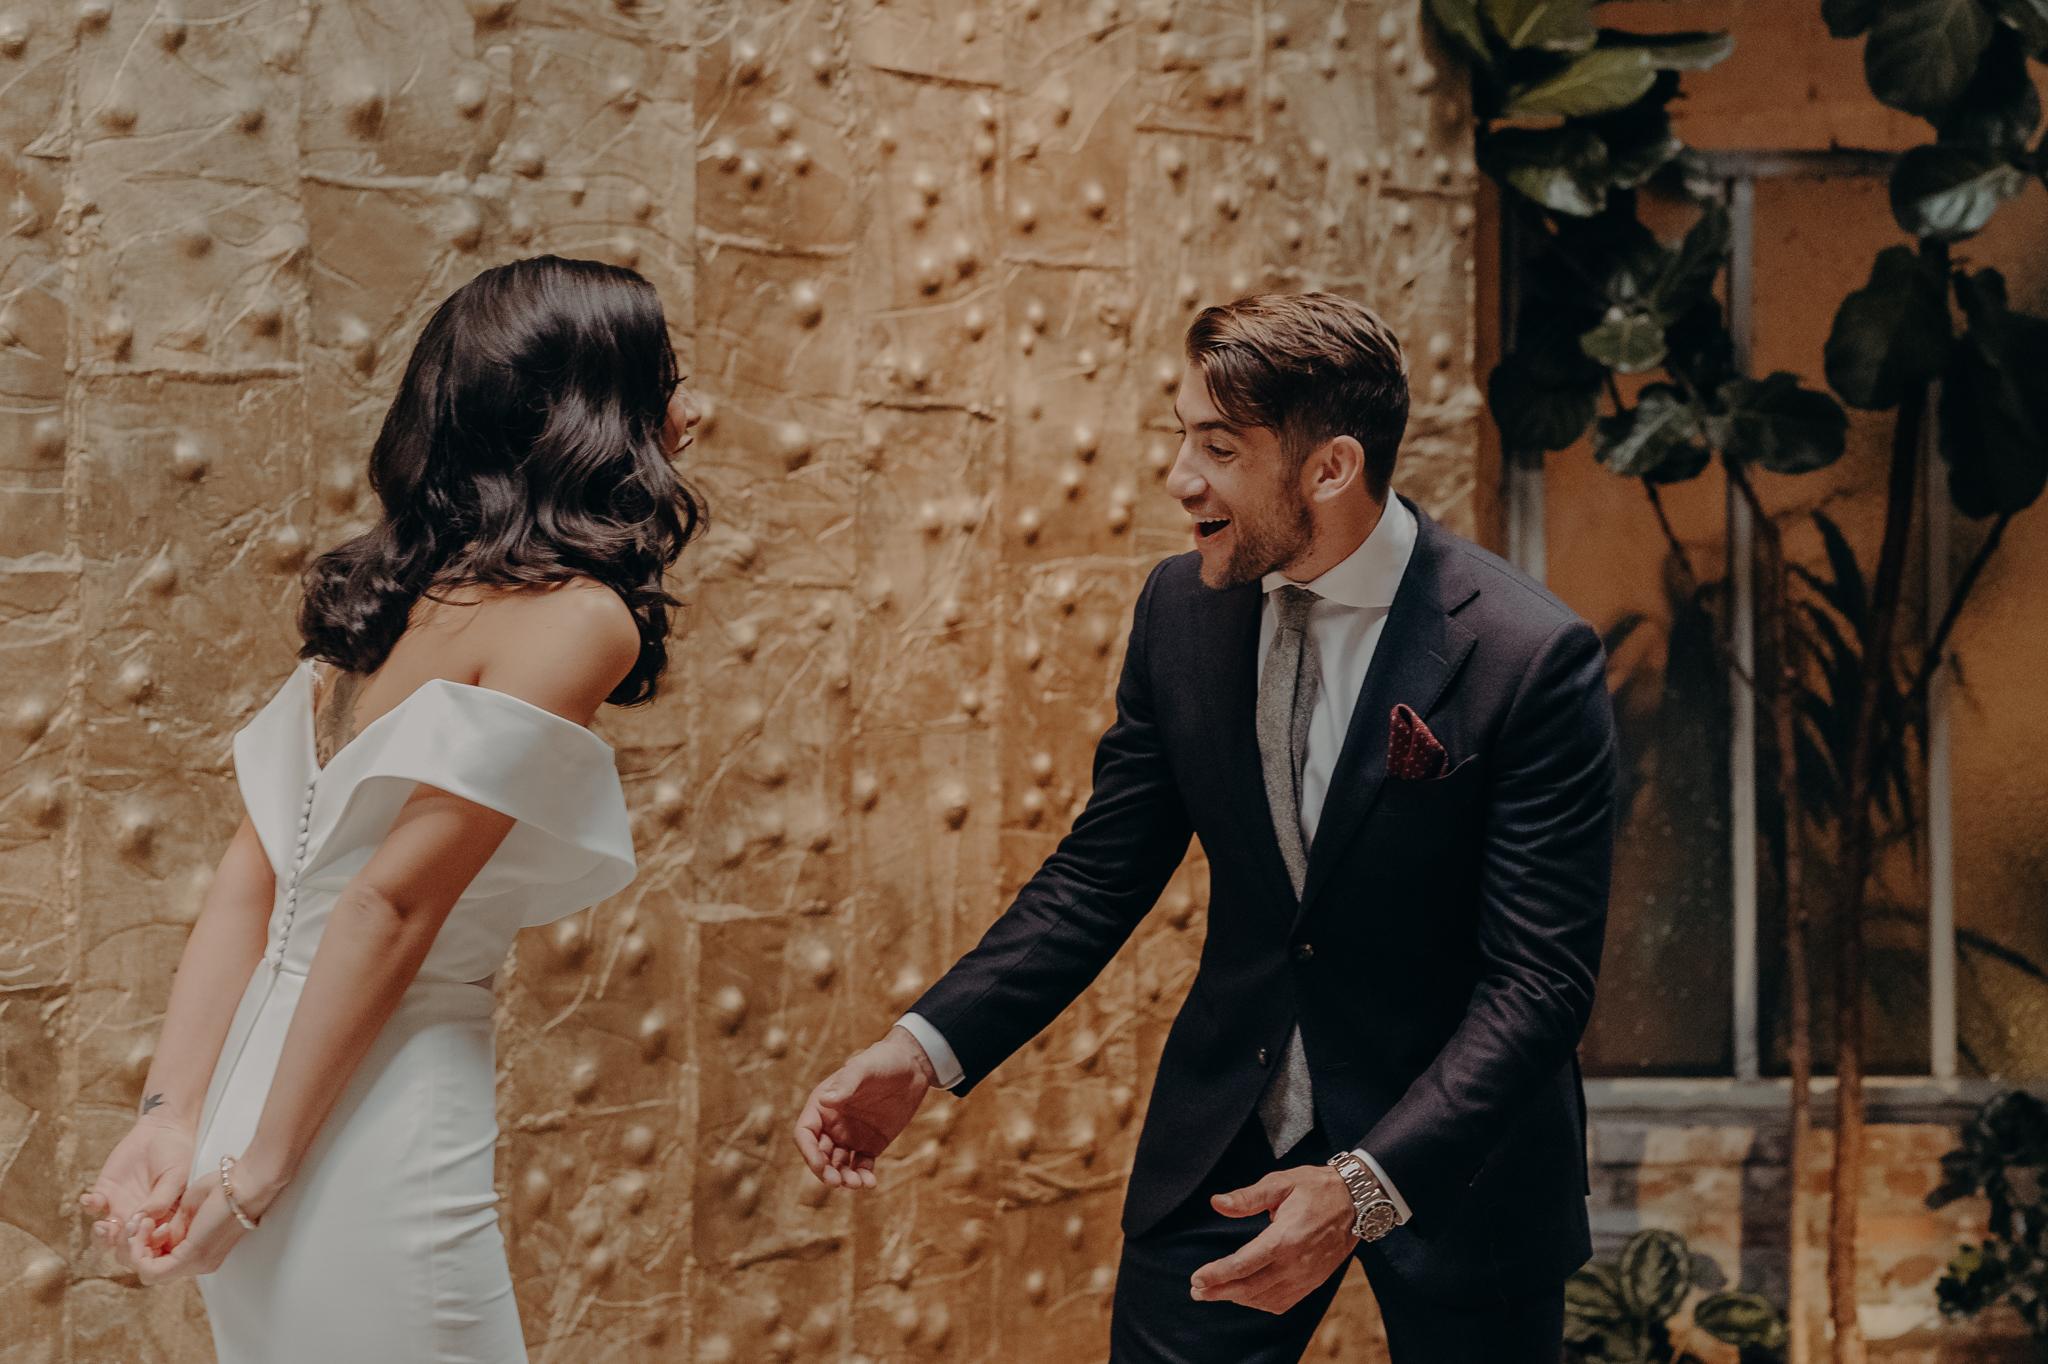 Wedding Photo LA - wedding photographer in los angeles - millwick wedding venue -isaiahandtaylor.com-023.jpg